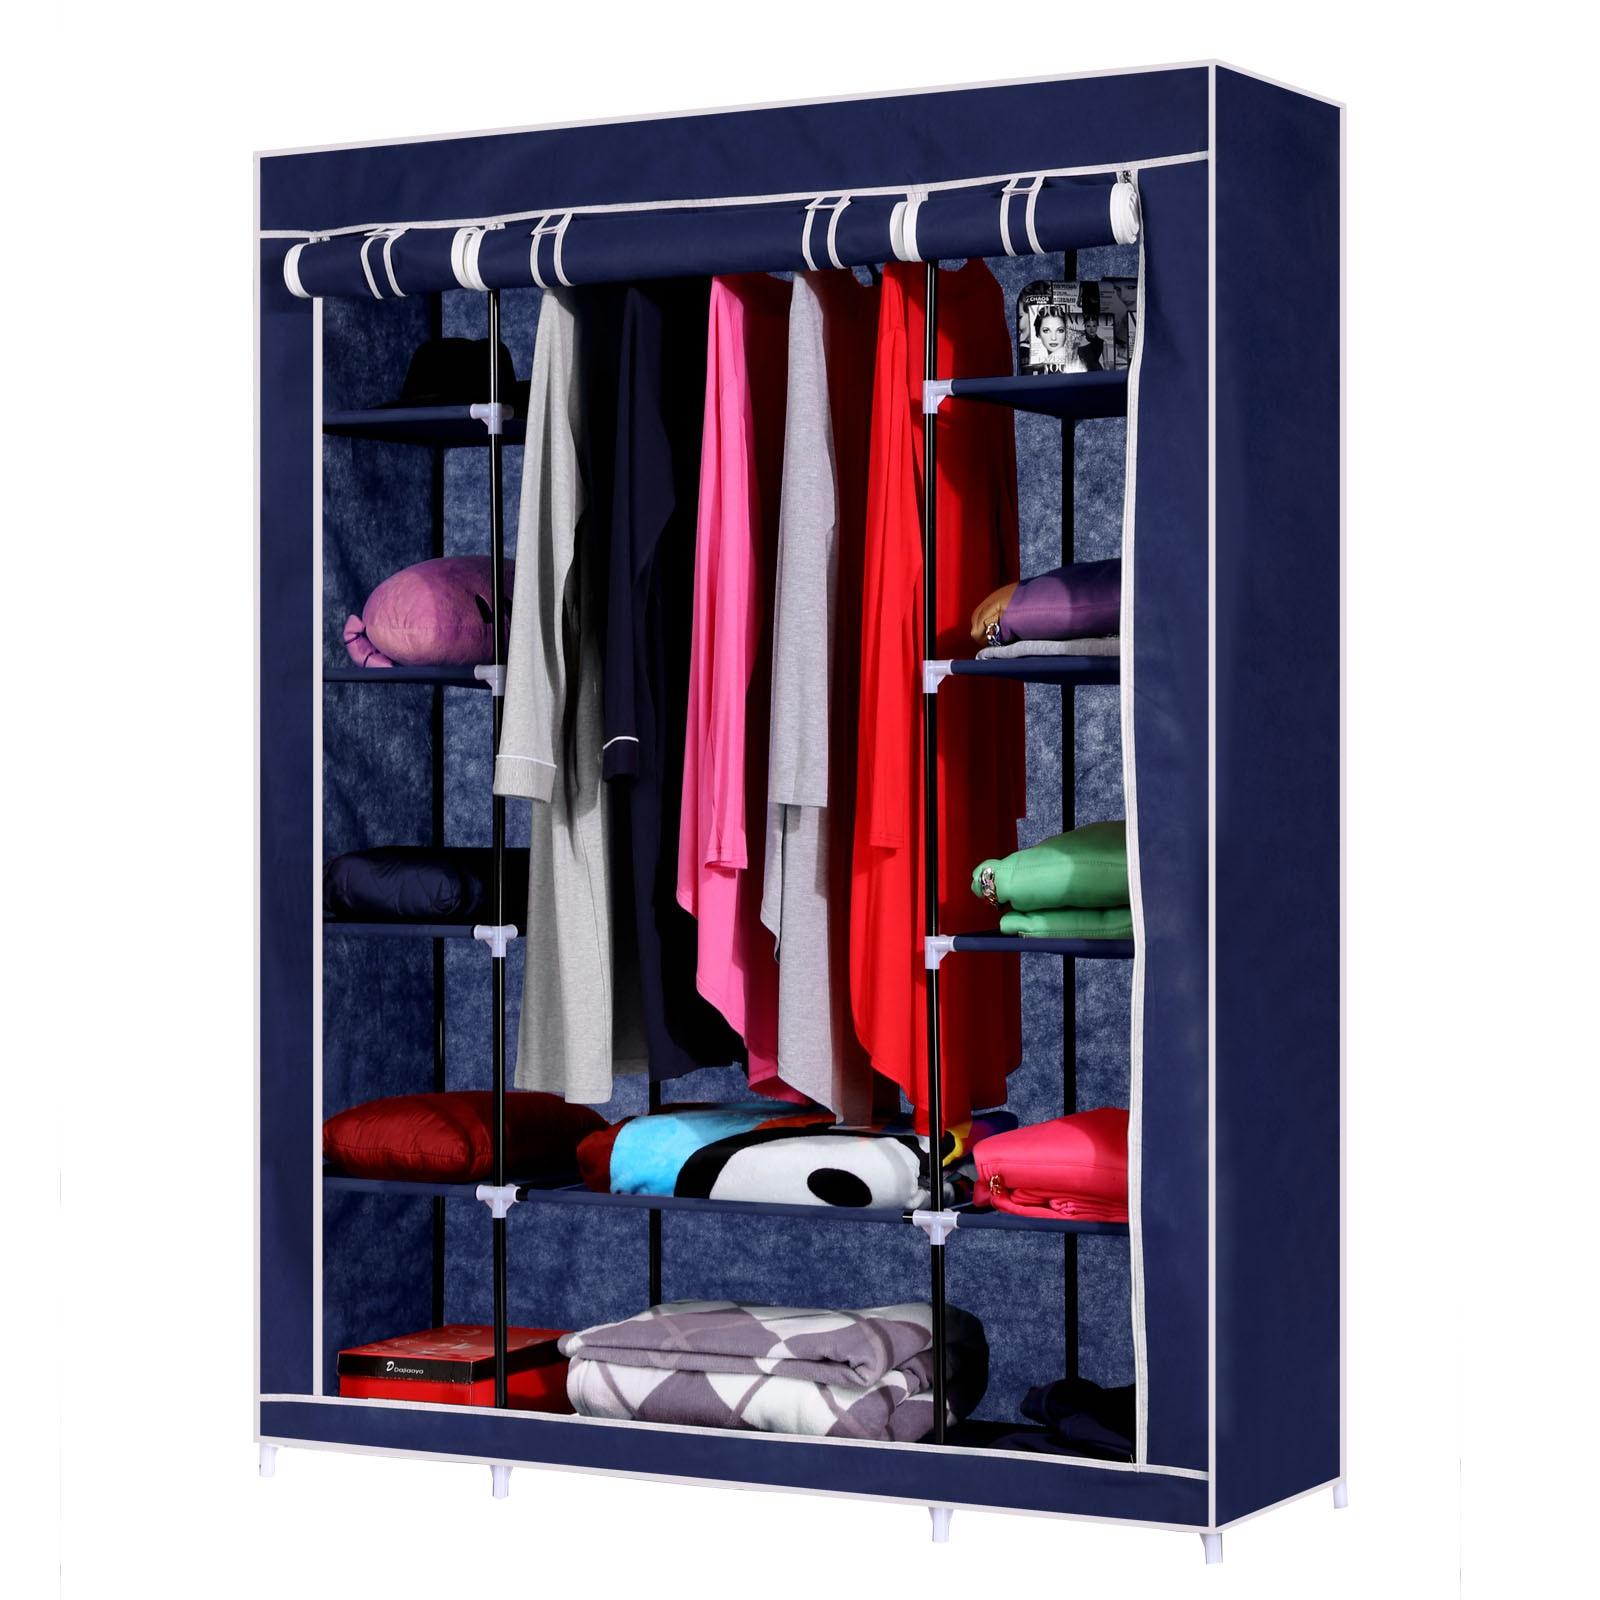 Buy Homdox Bedroom Furniture Folding Cloth Wardrobe Portable Clothes Closet